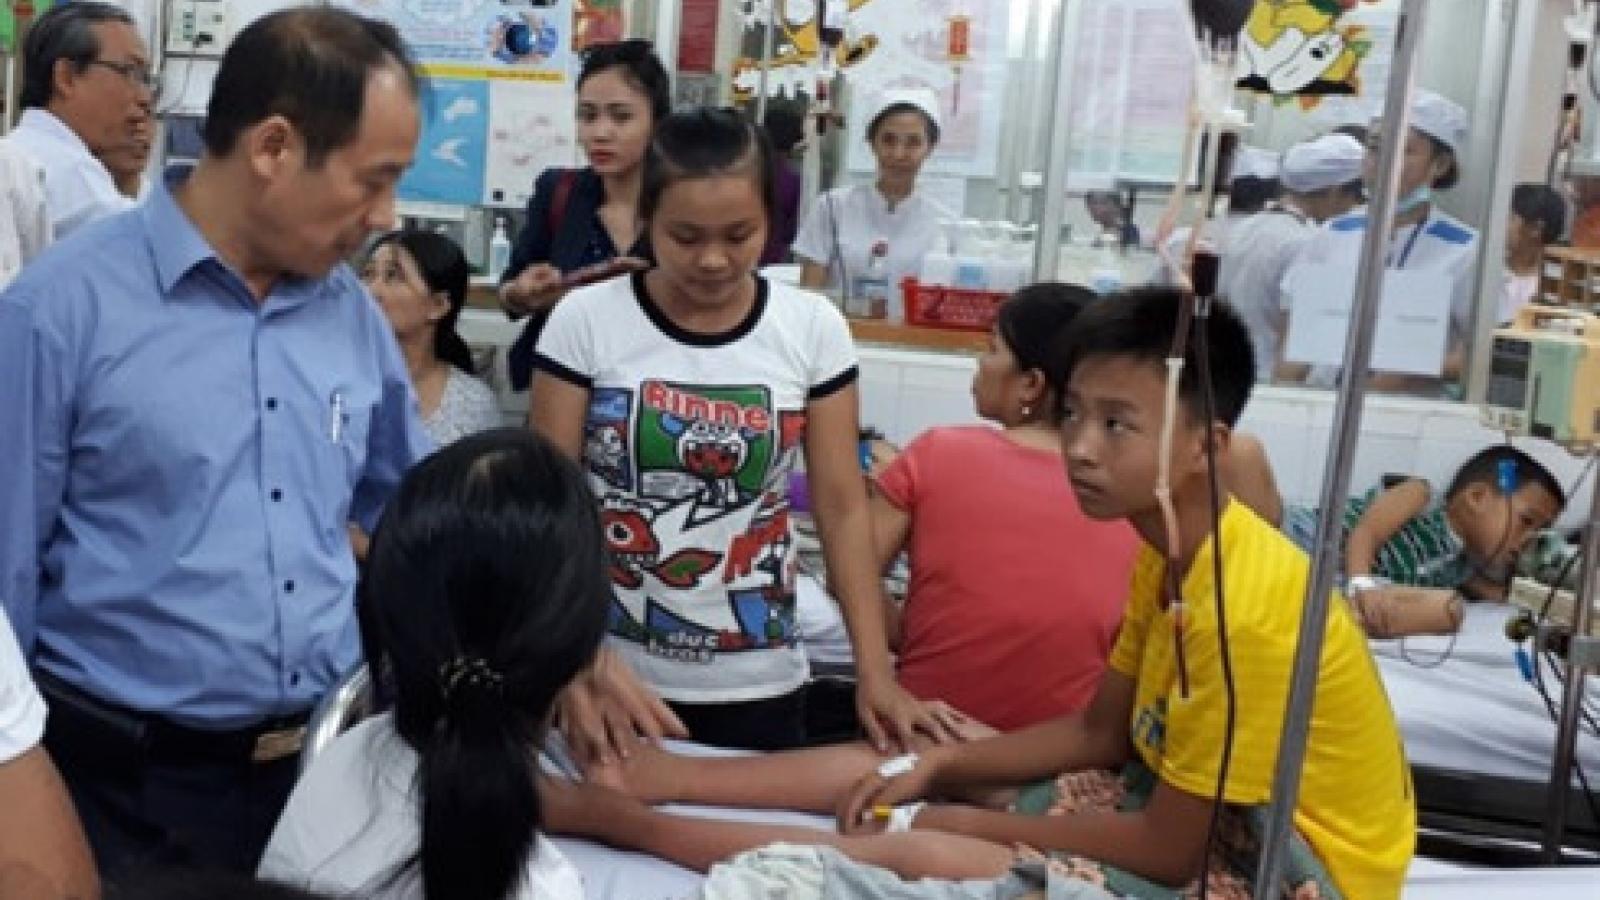 Vietnam struggling with dengue fever outbreak